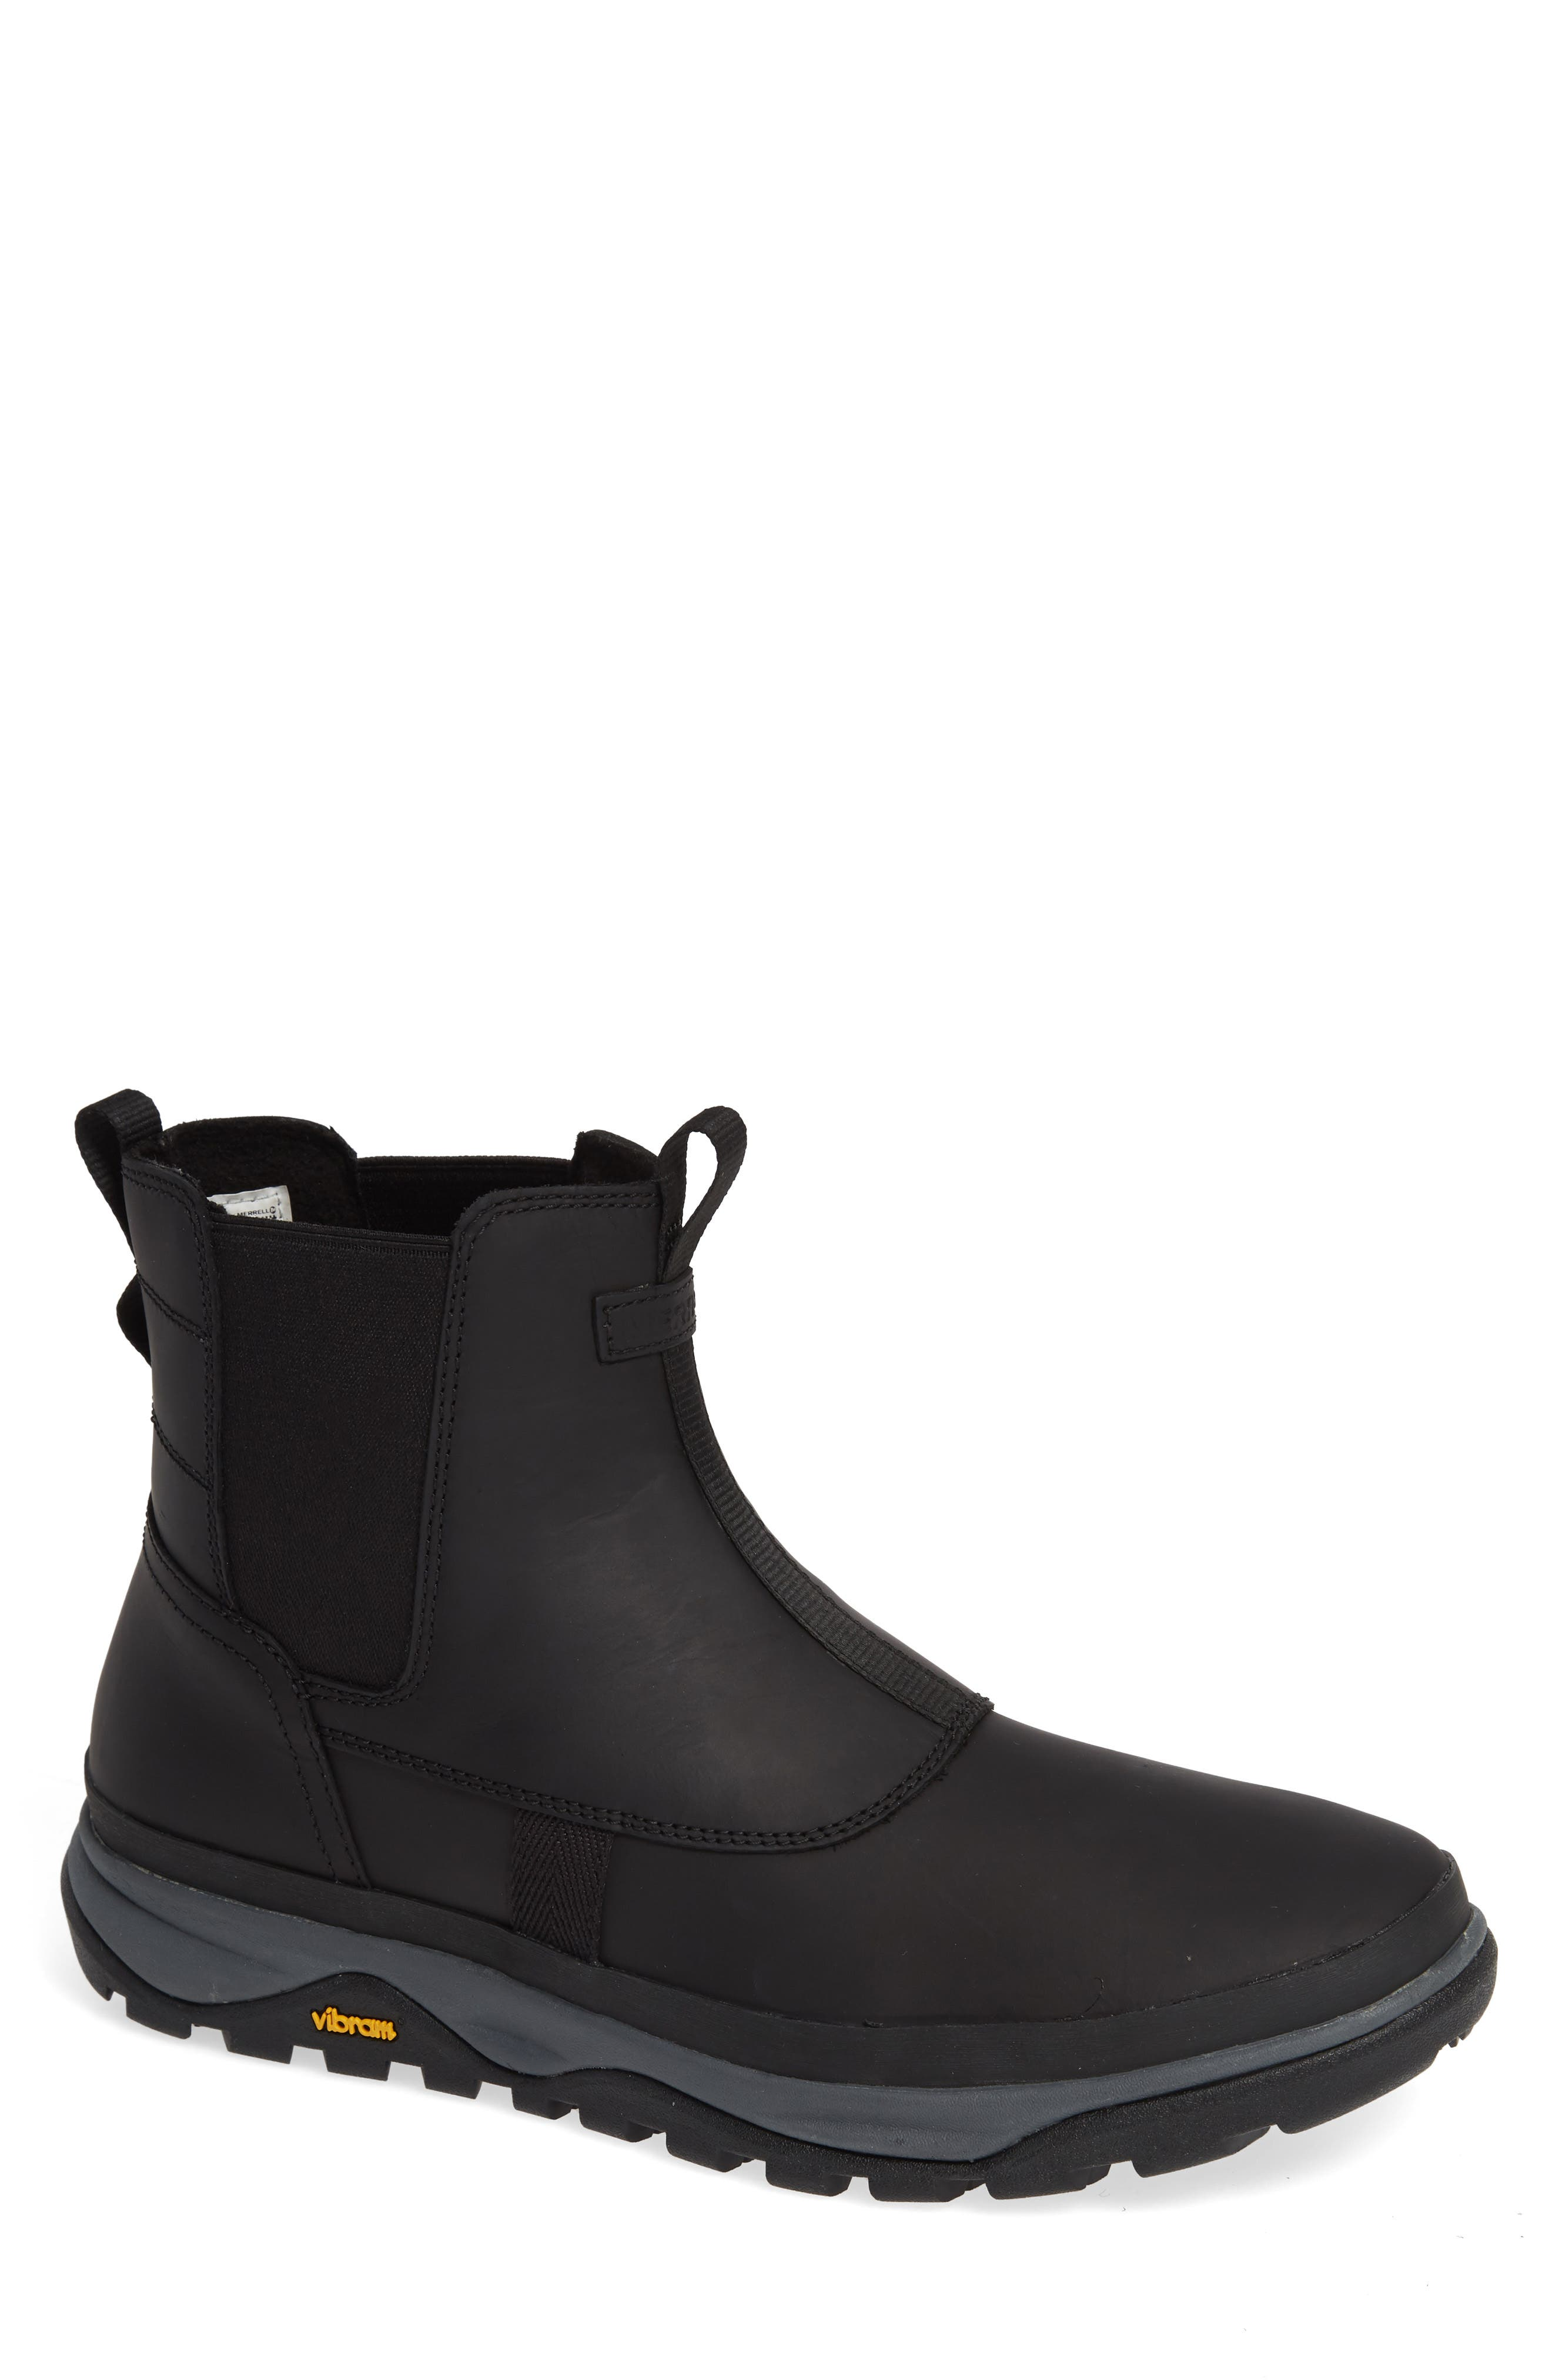 Tremblant Waterproof Snow Boot,                             Main thumbnail 1, color,                             BLACK